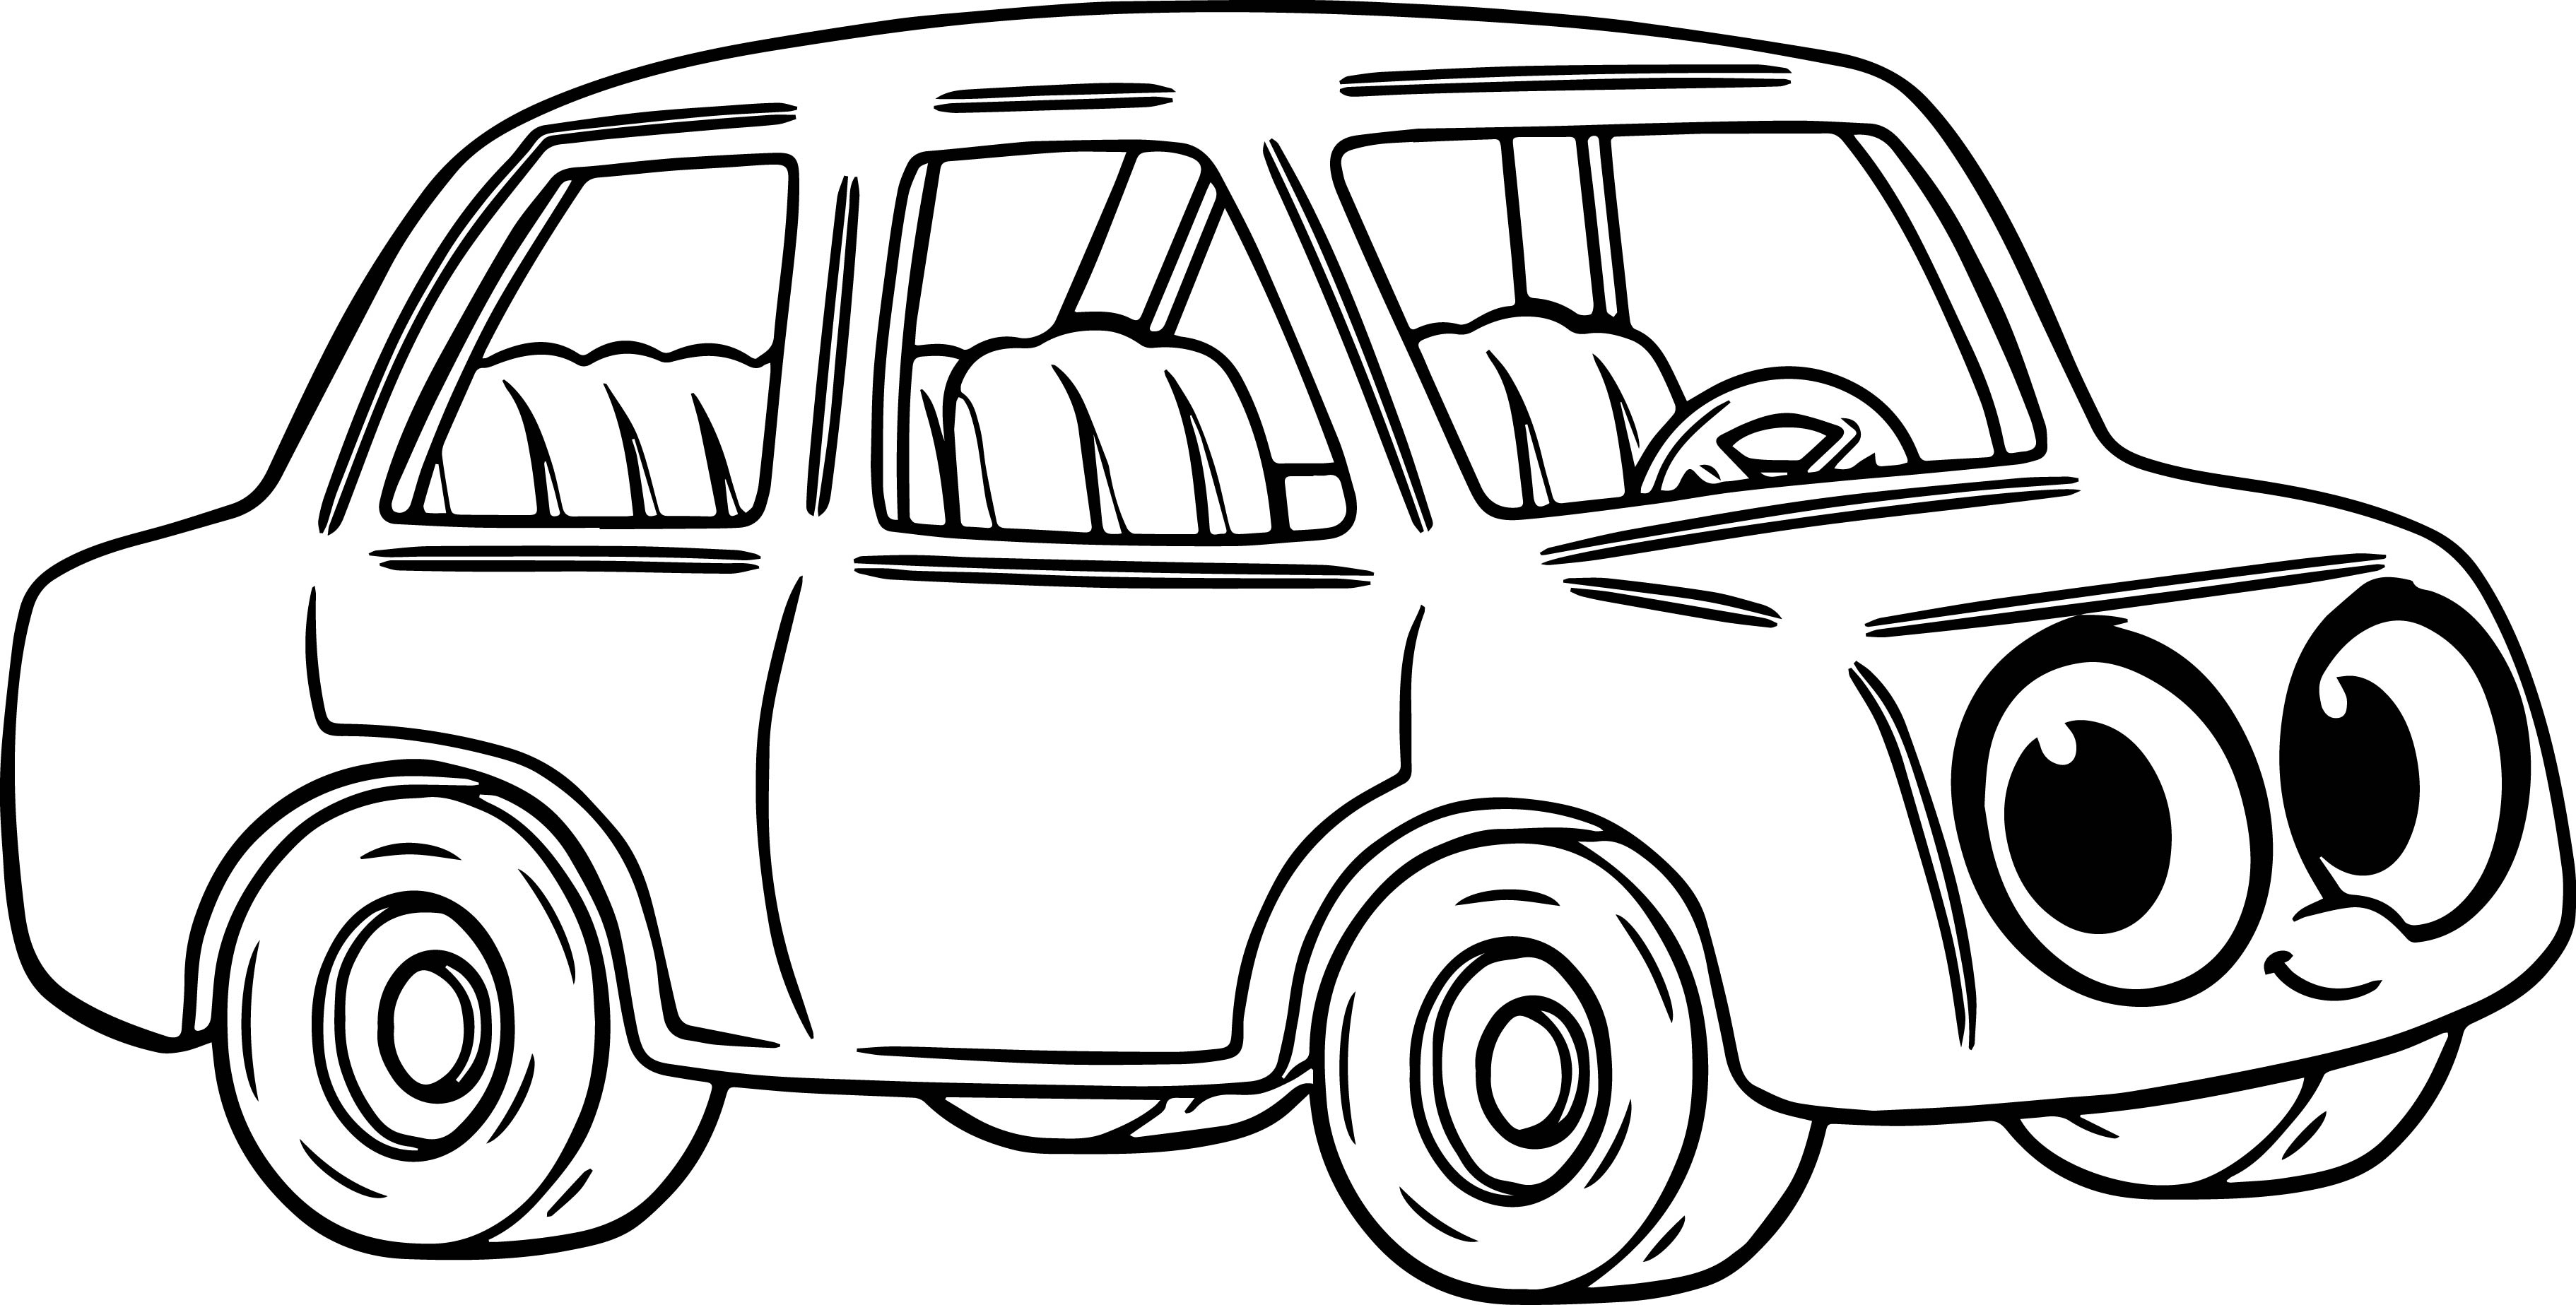 Cartoon Car Coloring Pages At Getdrawings Free Download